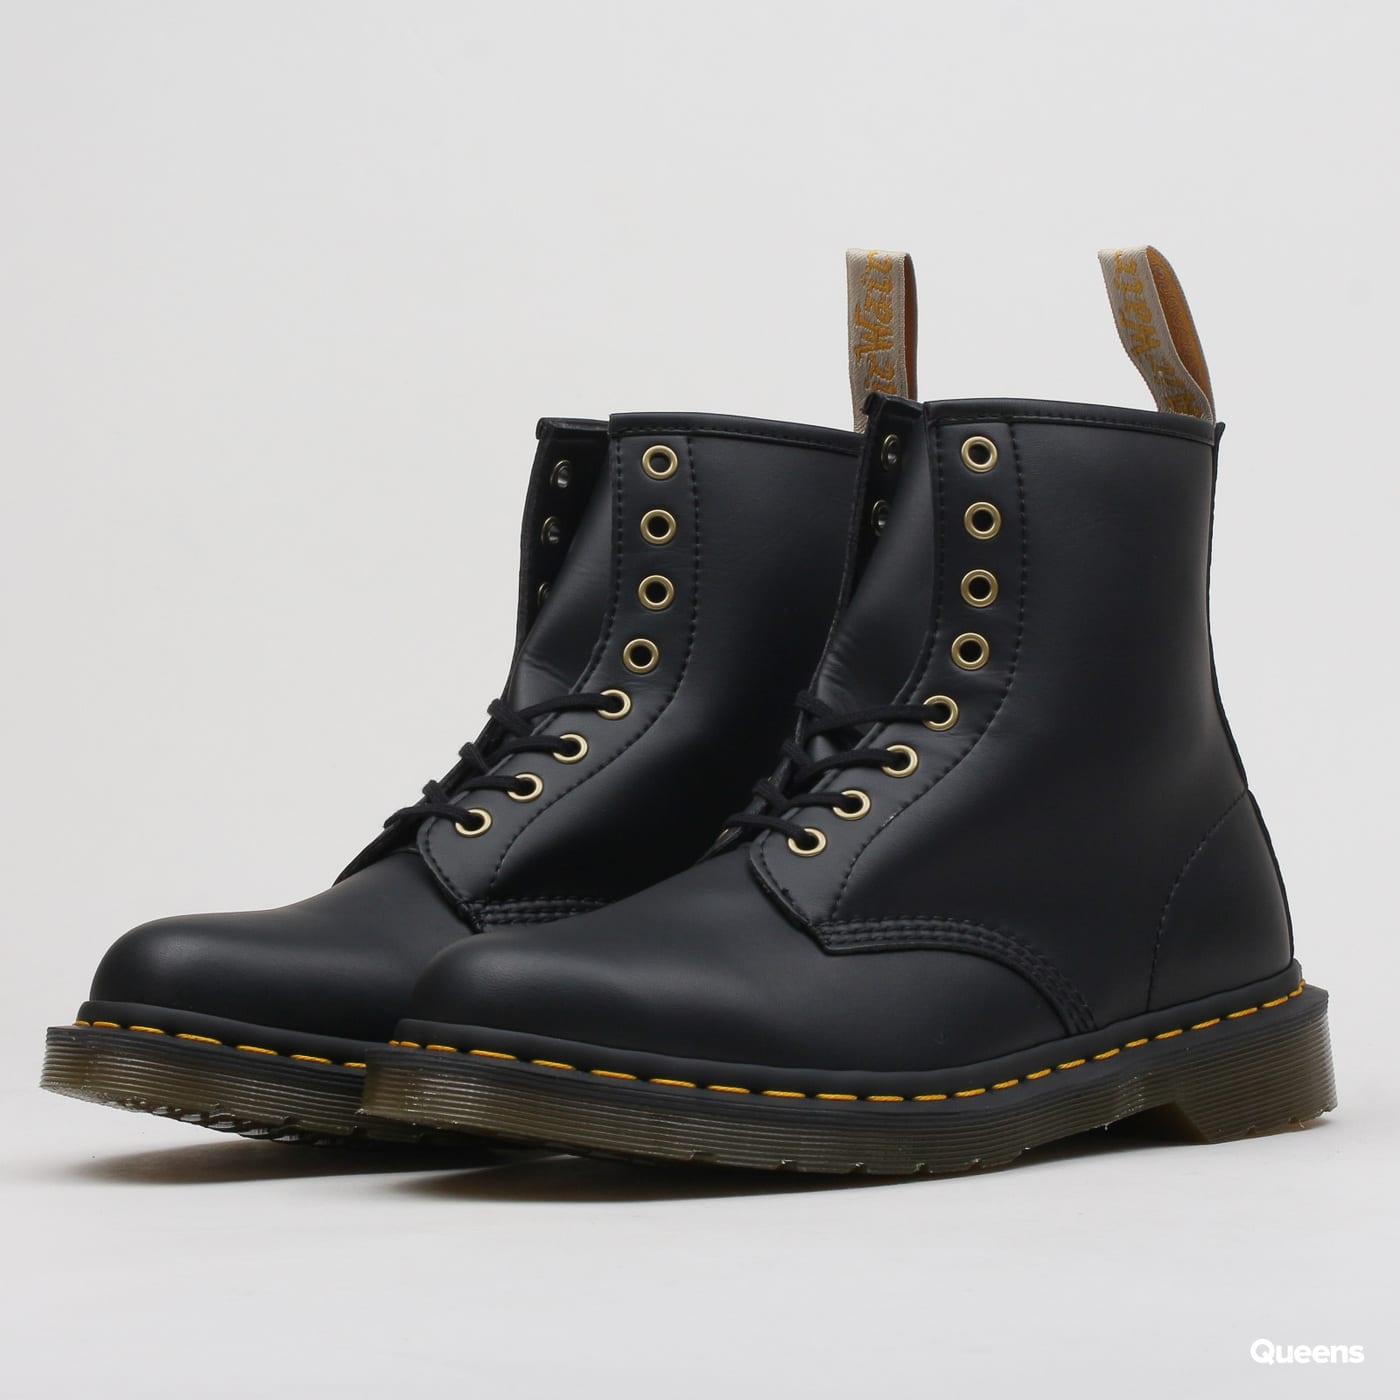 9be475b0611 Pánské zimní boty Dr. Martens Vegan 1460 (DM14045001) – Queens 💚